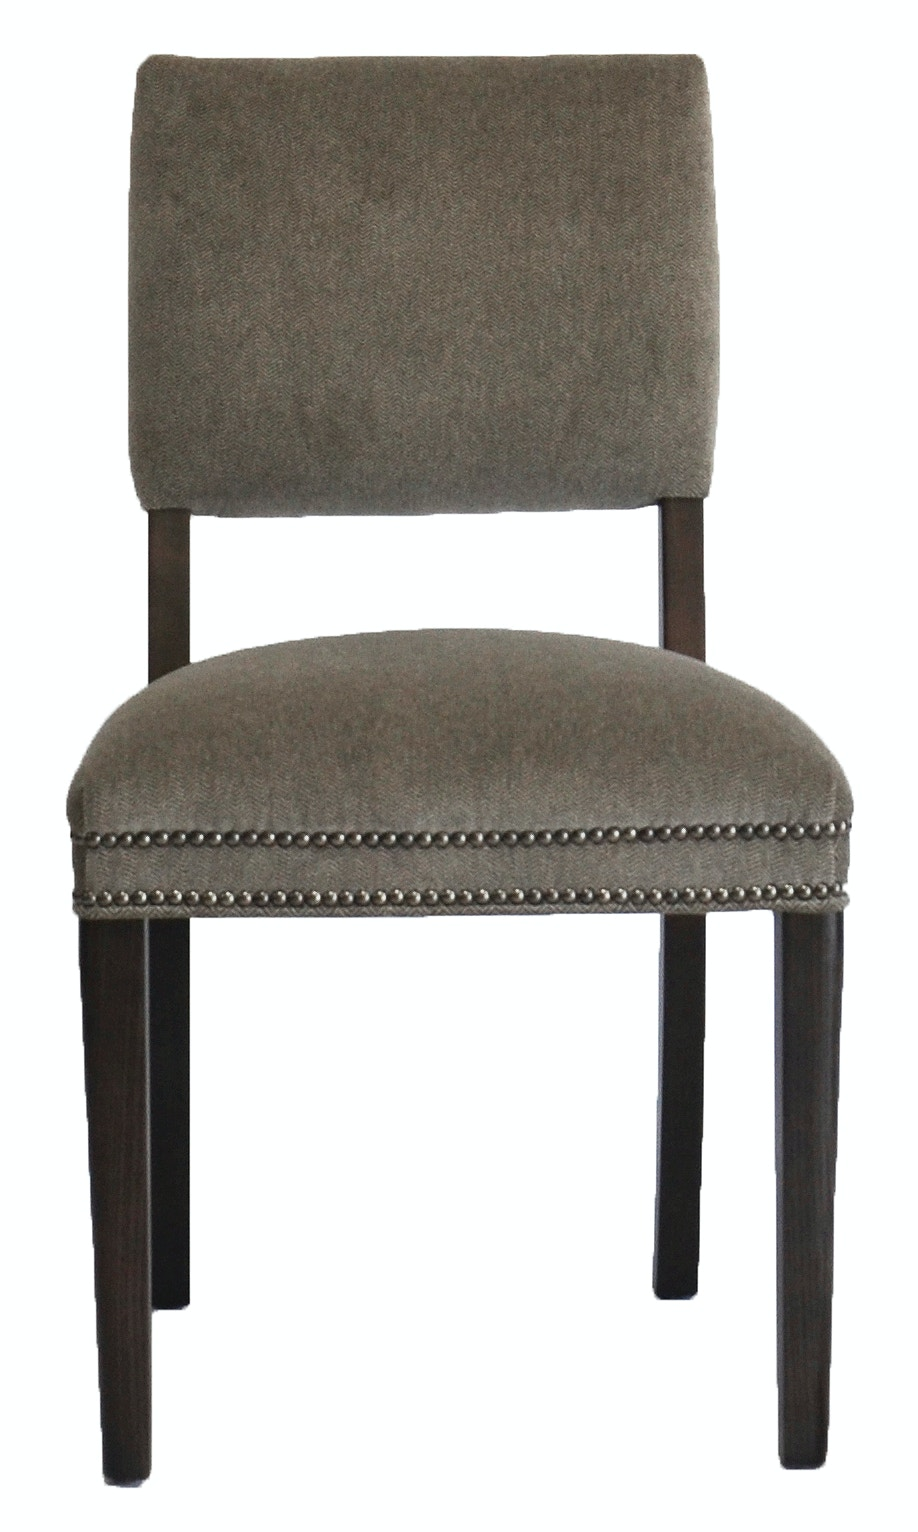 Vanguard Furniture Michael Weiss Newton Side Chair Vanguard W709S